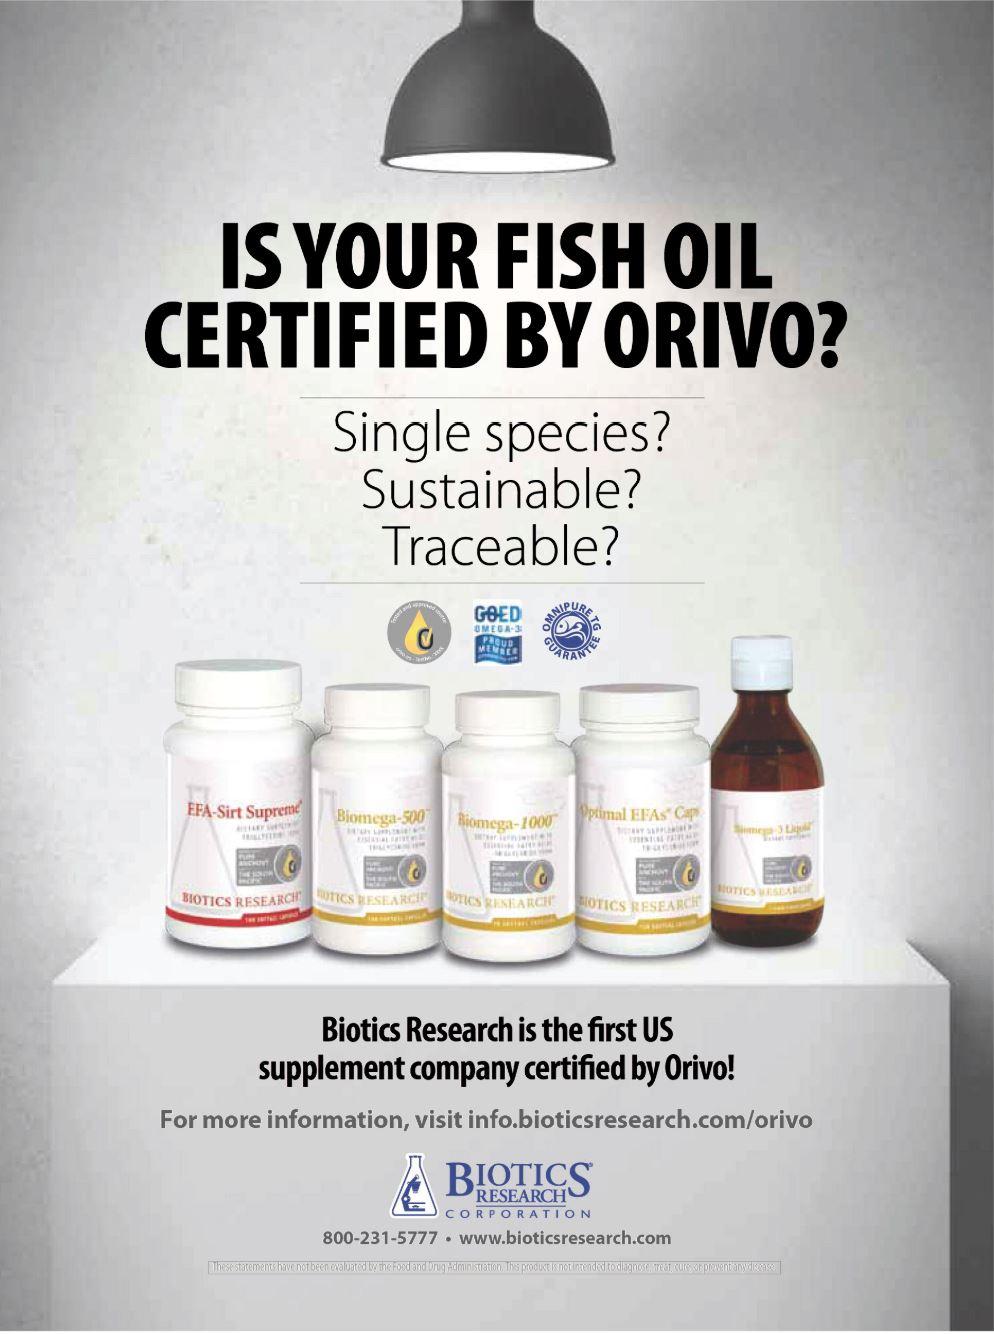 430 Biotics Fish Oil.JPG